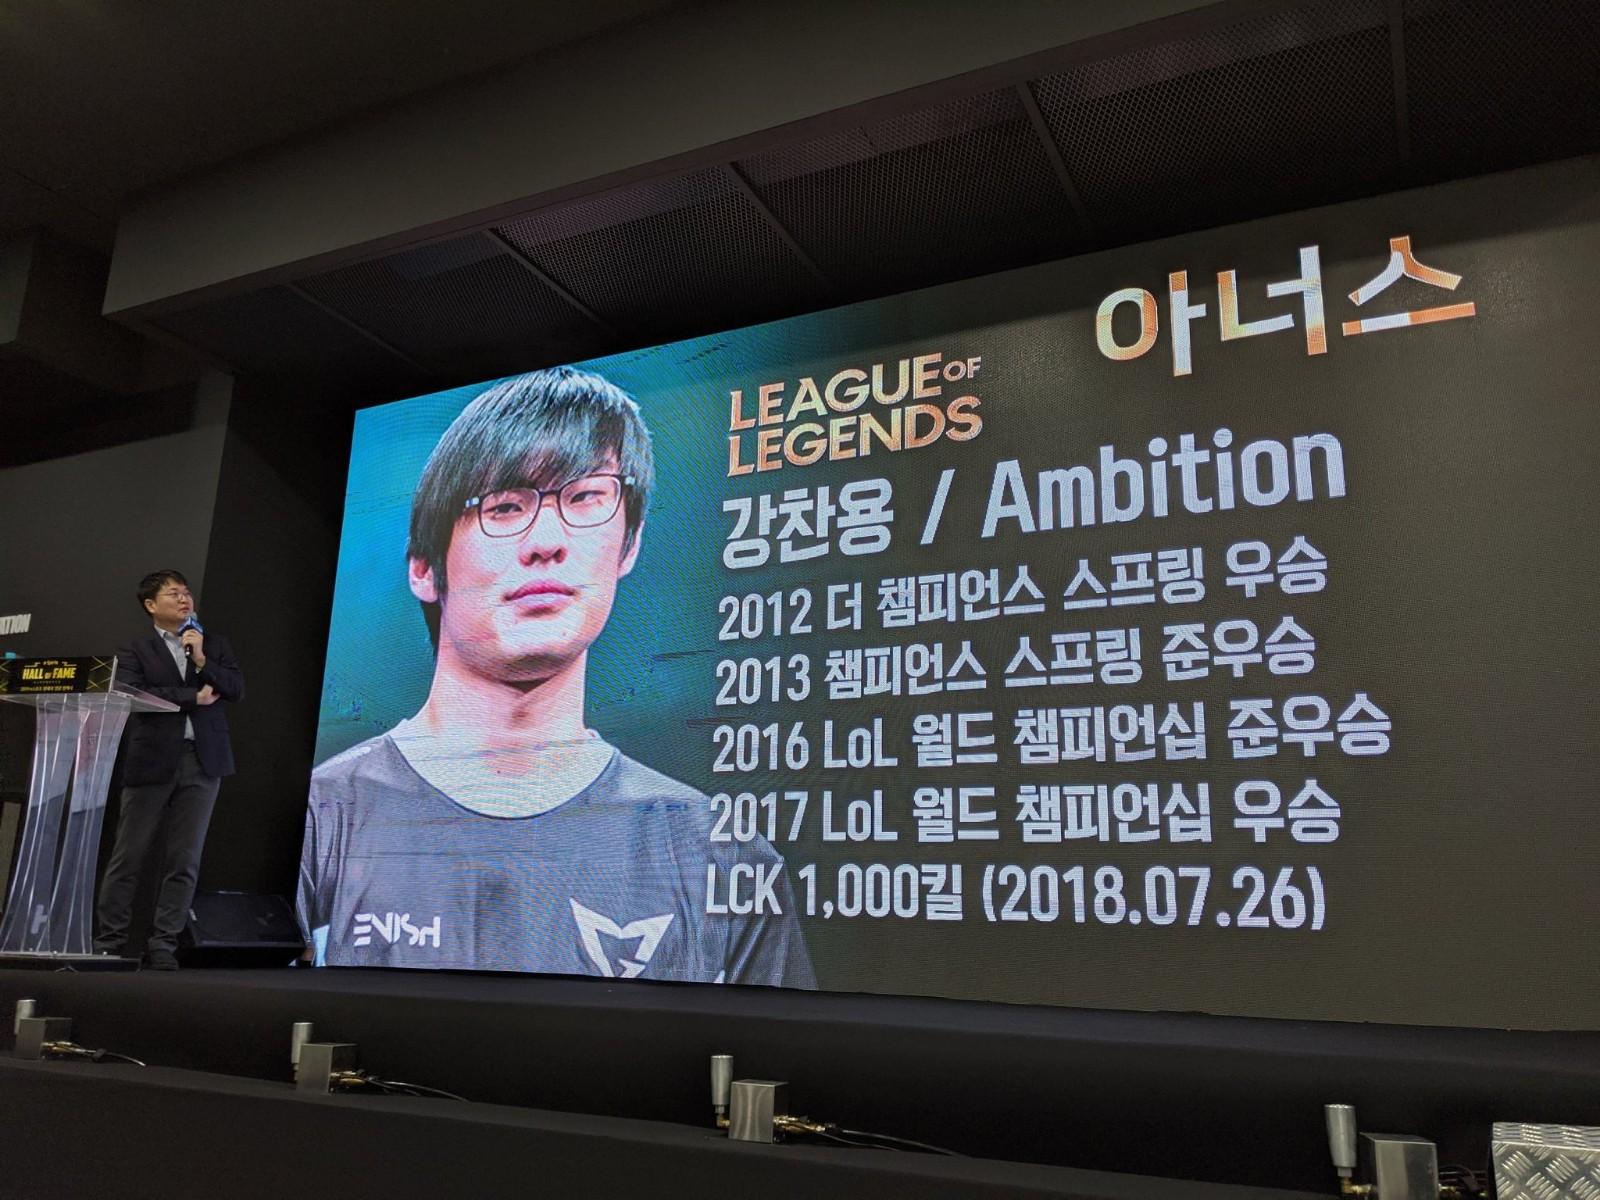 Ambition与Bengi被授予韩国名人堂荣誉奖